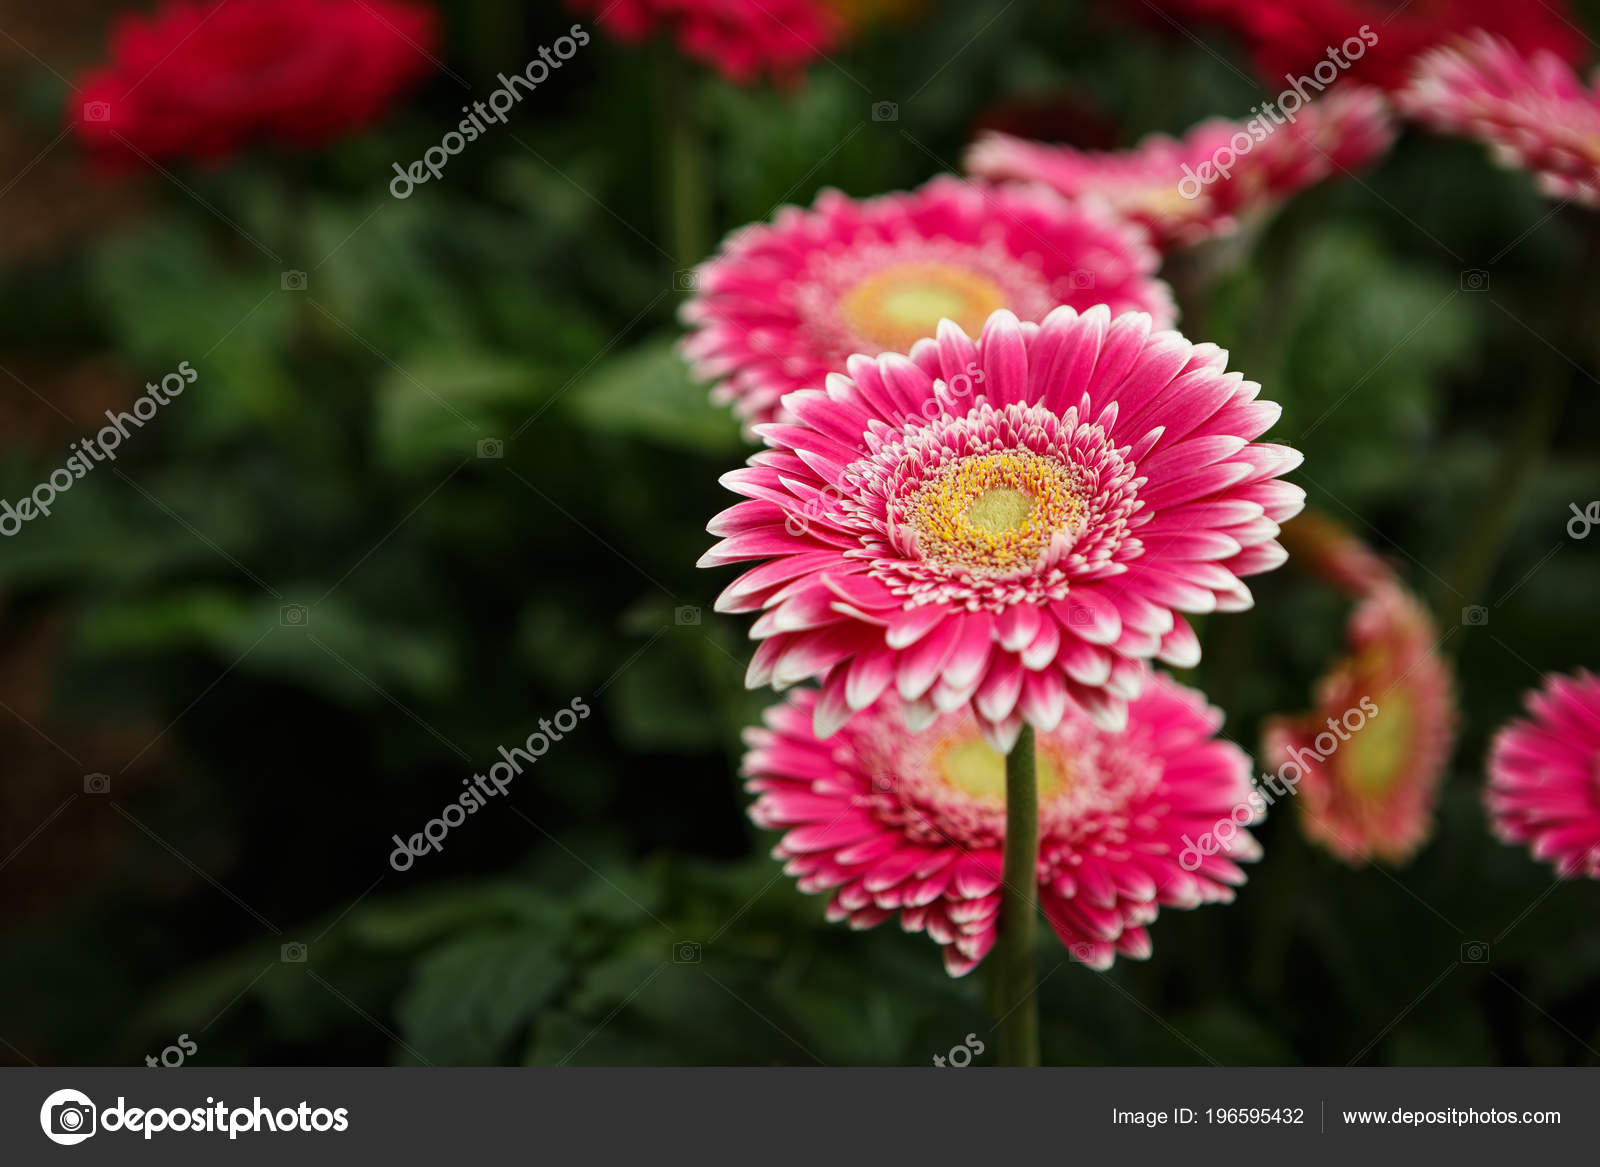 Beautiful Colorful Pink Transvaal Daisies Flowers Bloom Spring